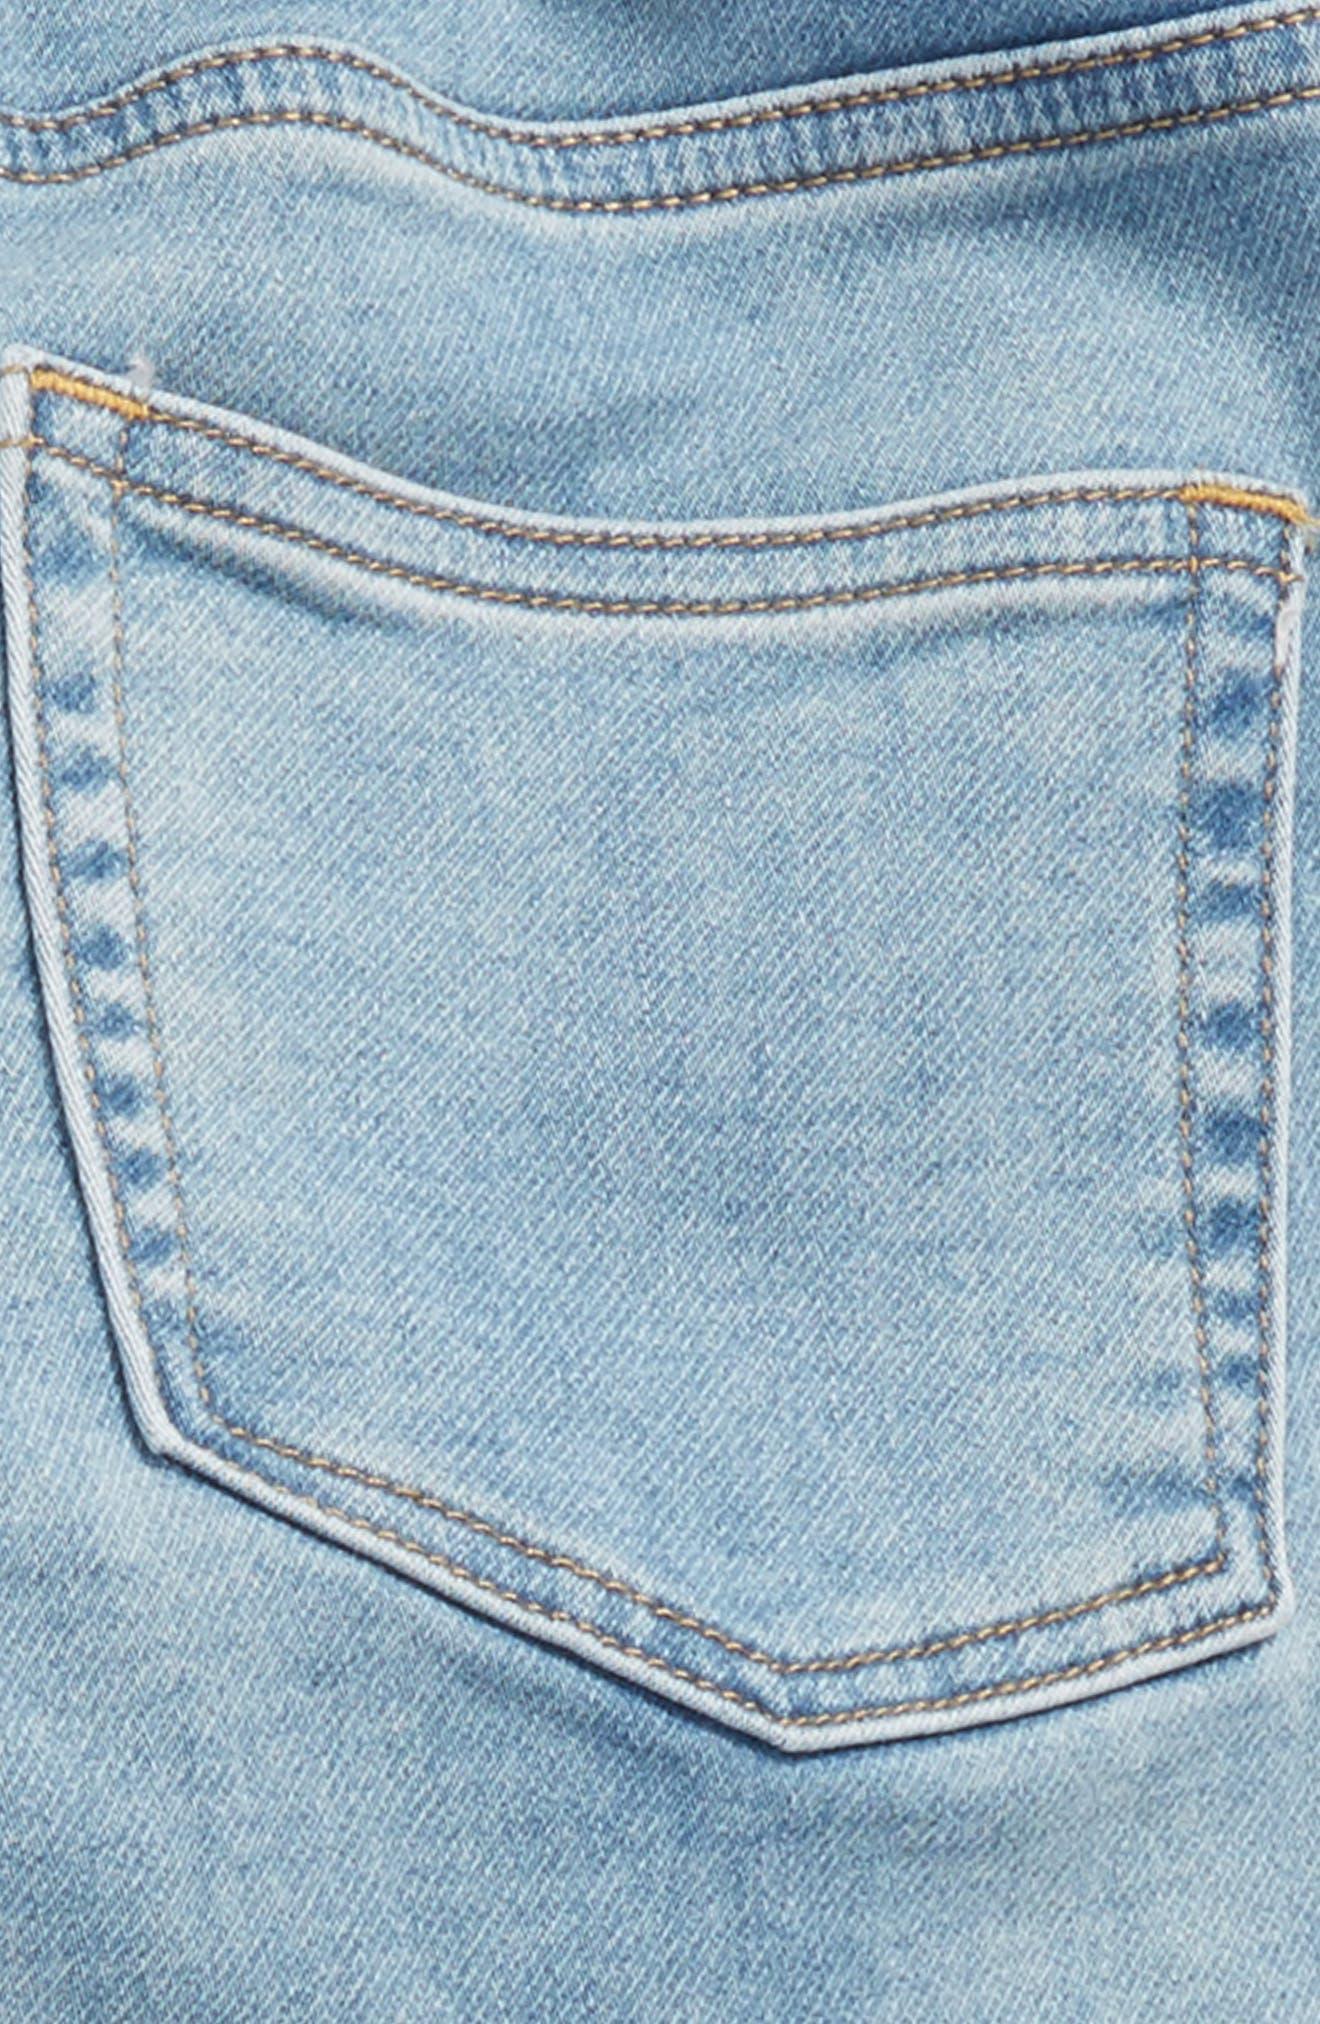 Runaround Stretch Denim Jeans,                             Alternate thumbnail 3, color,                             PATCHWORK WASH